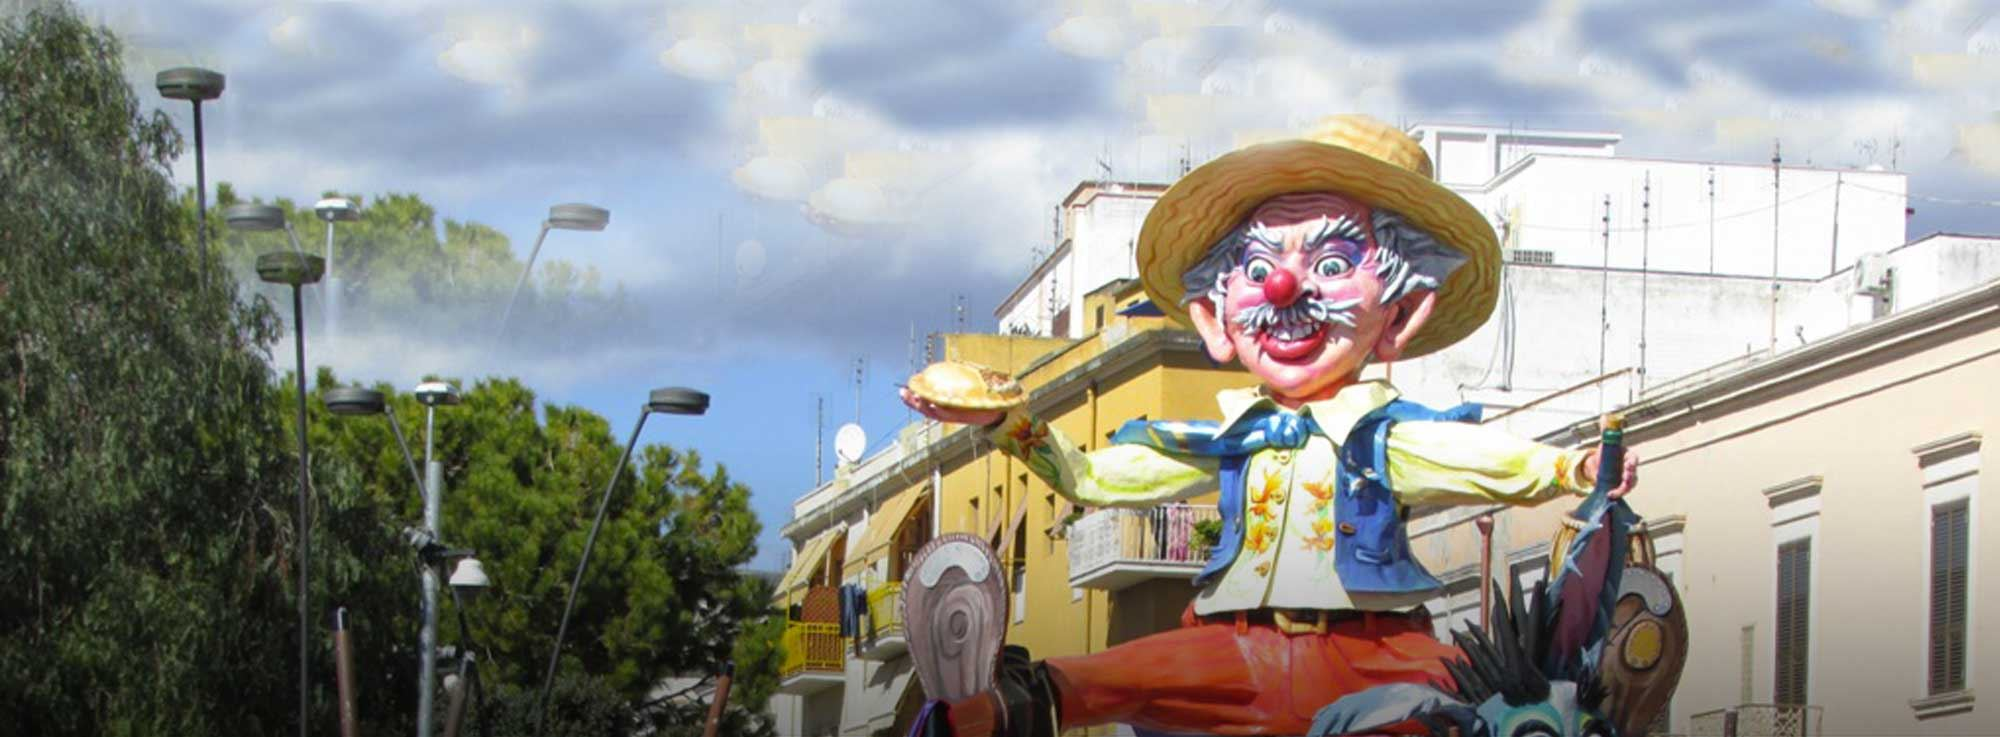 Manfredonia: Carnevale di Manfredonia